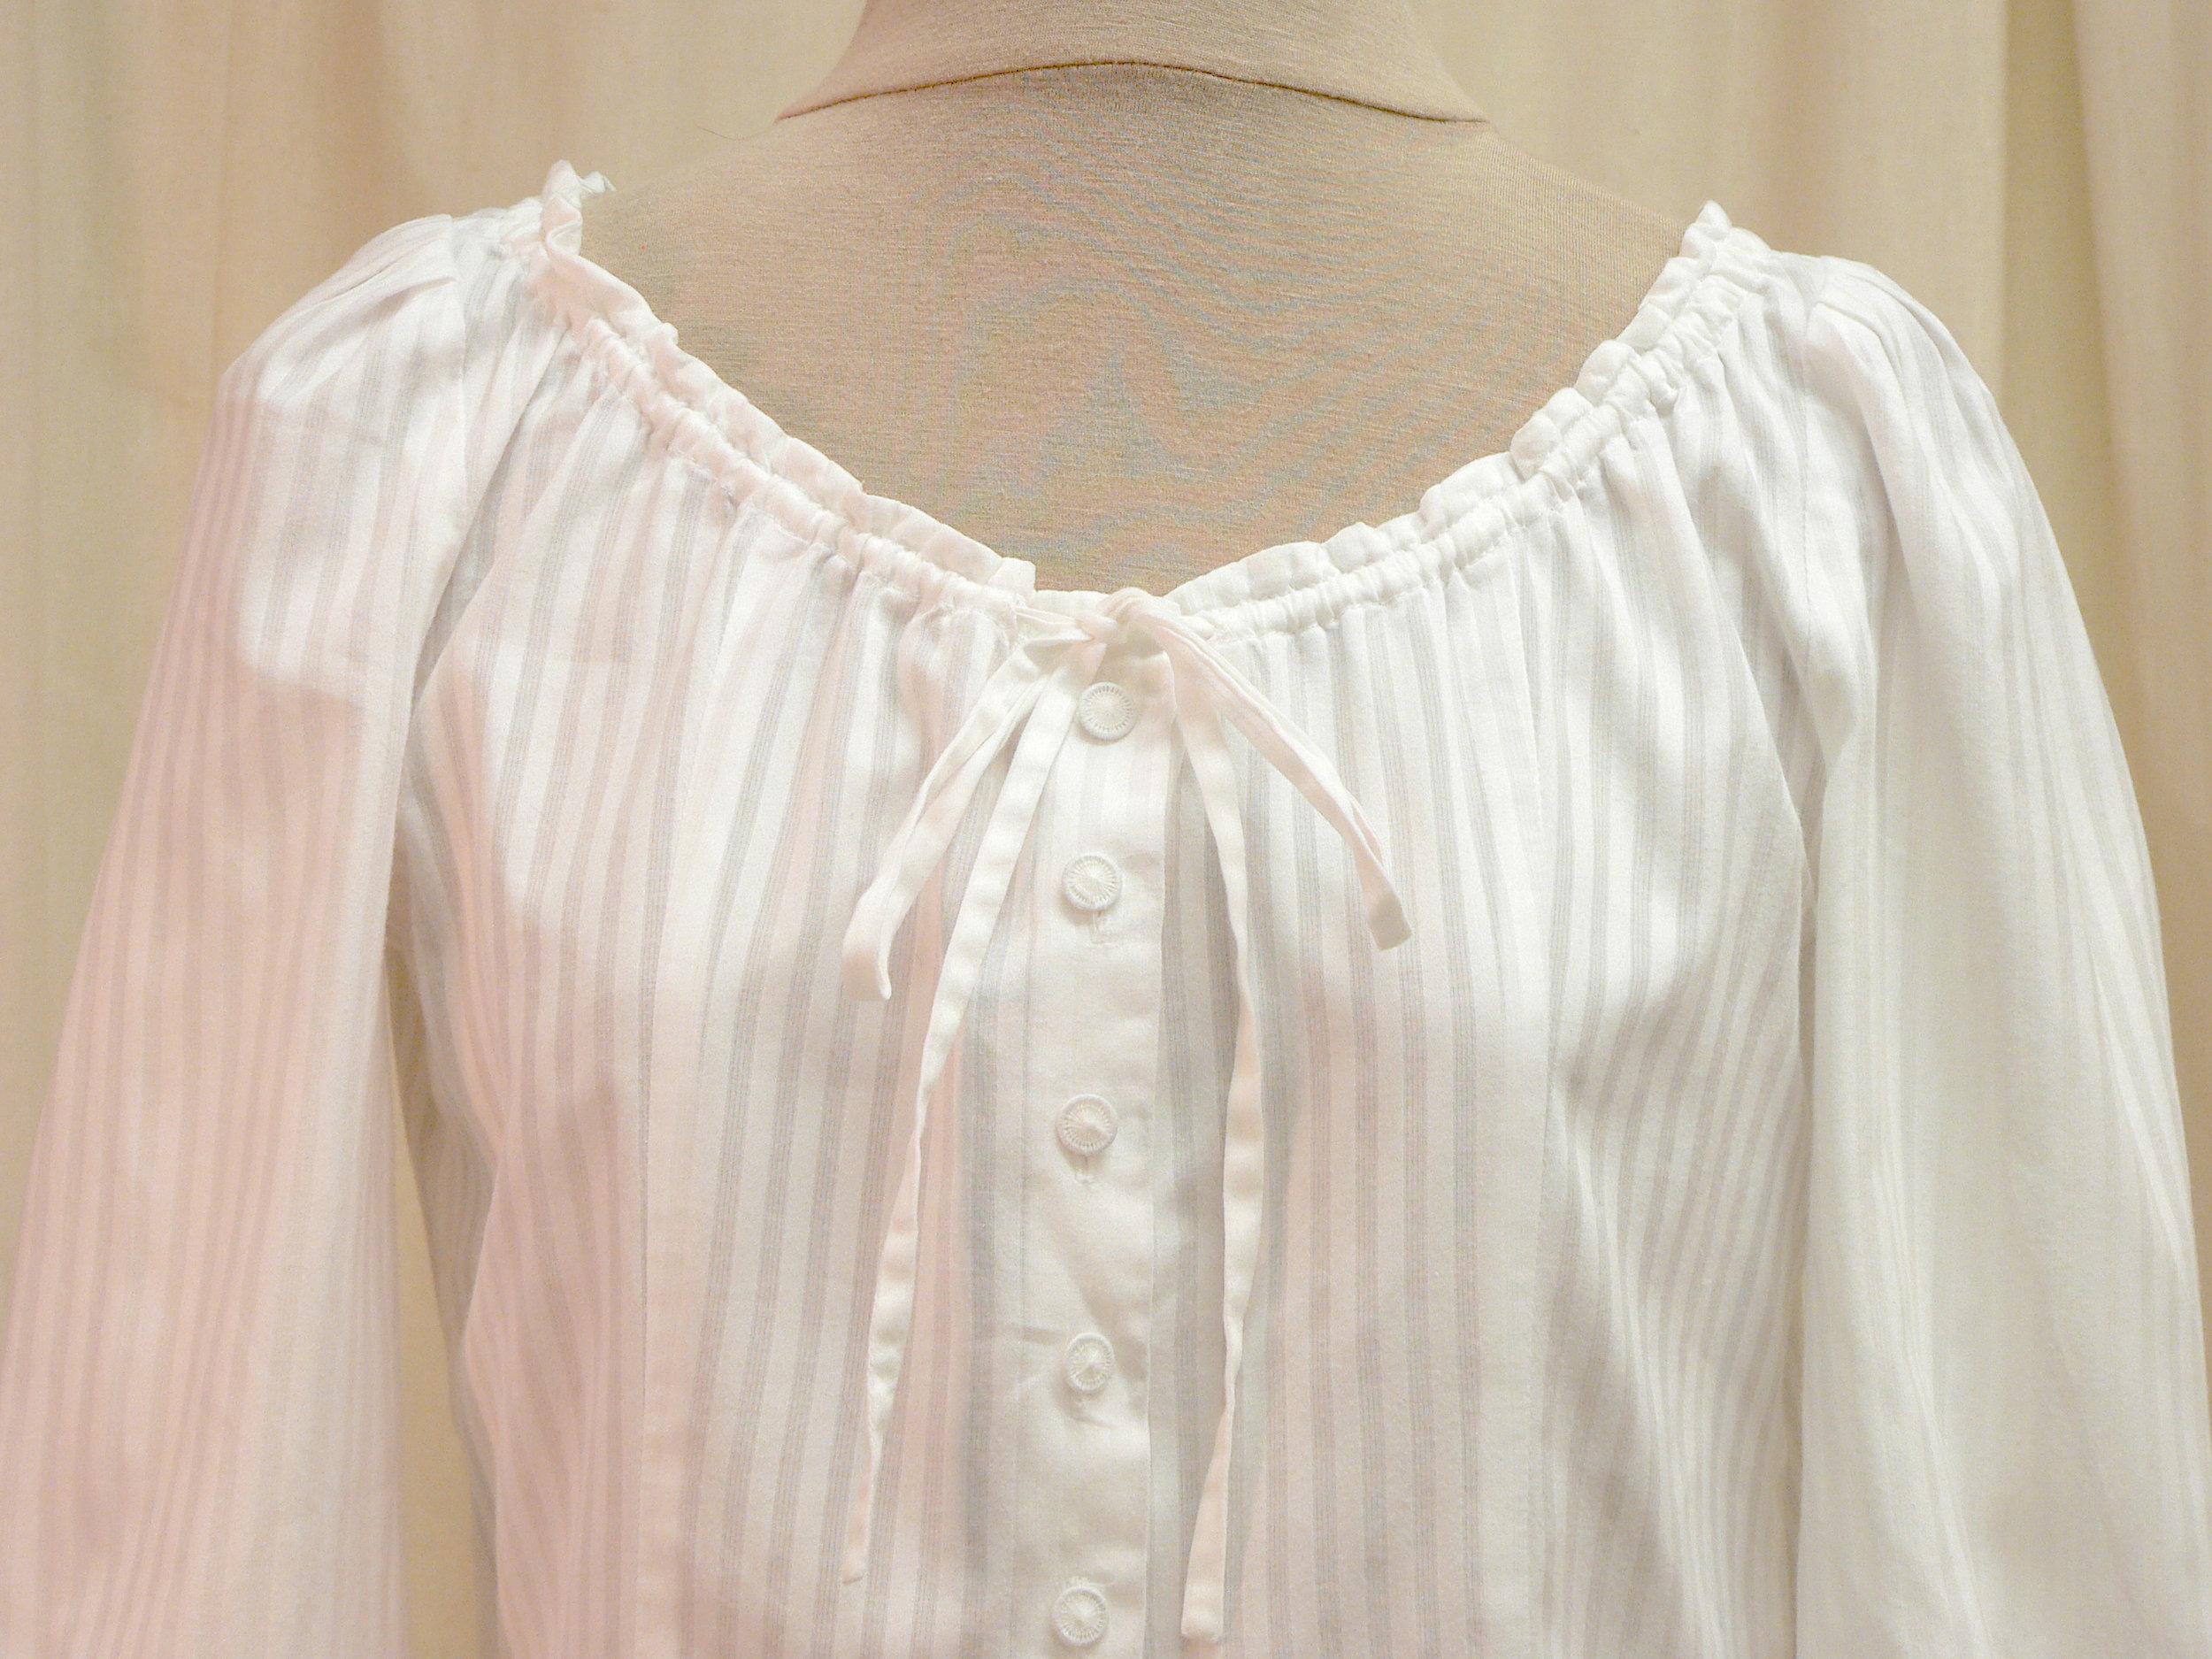 blouse07_front_detail.jpg